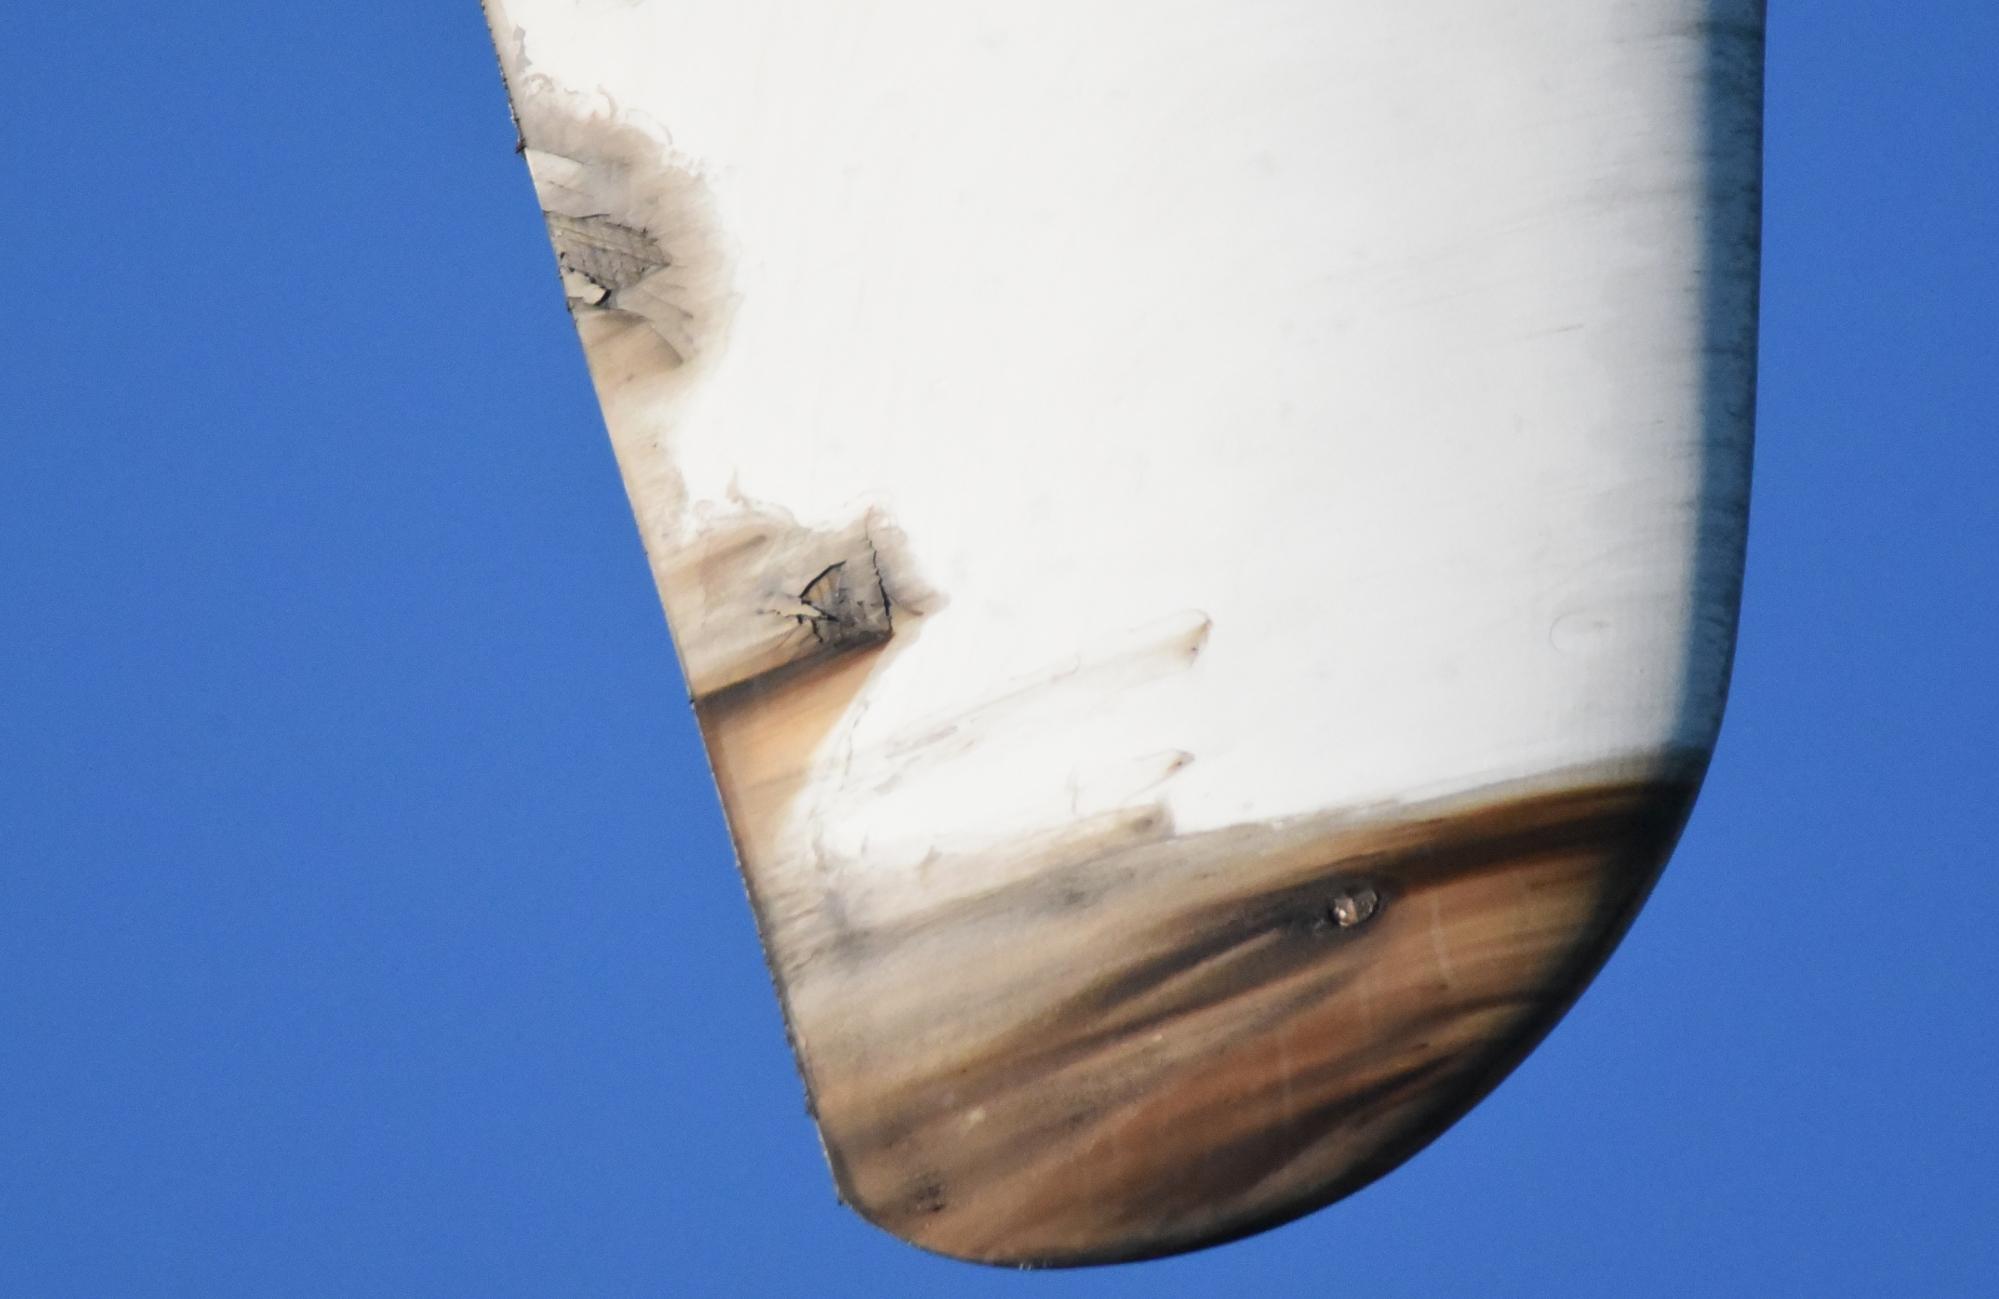 oil in blade